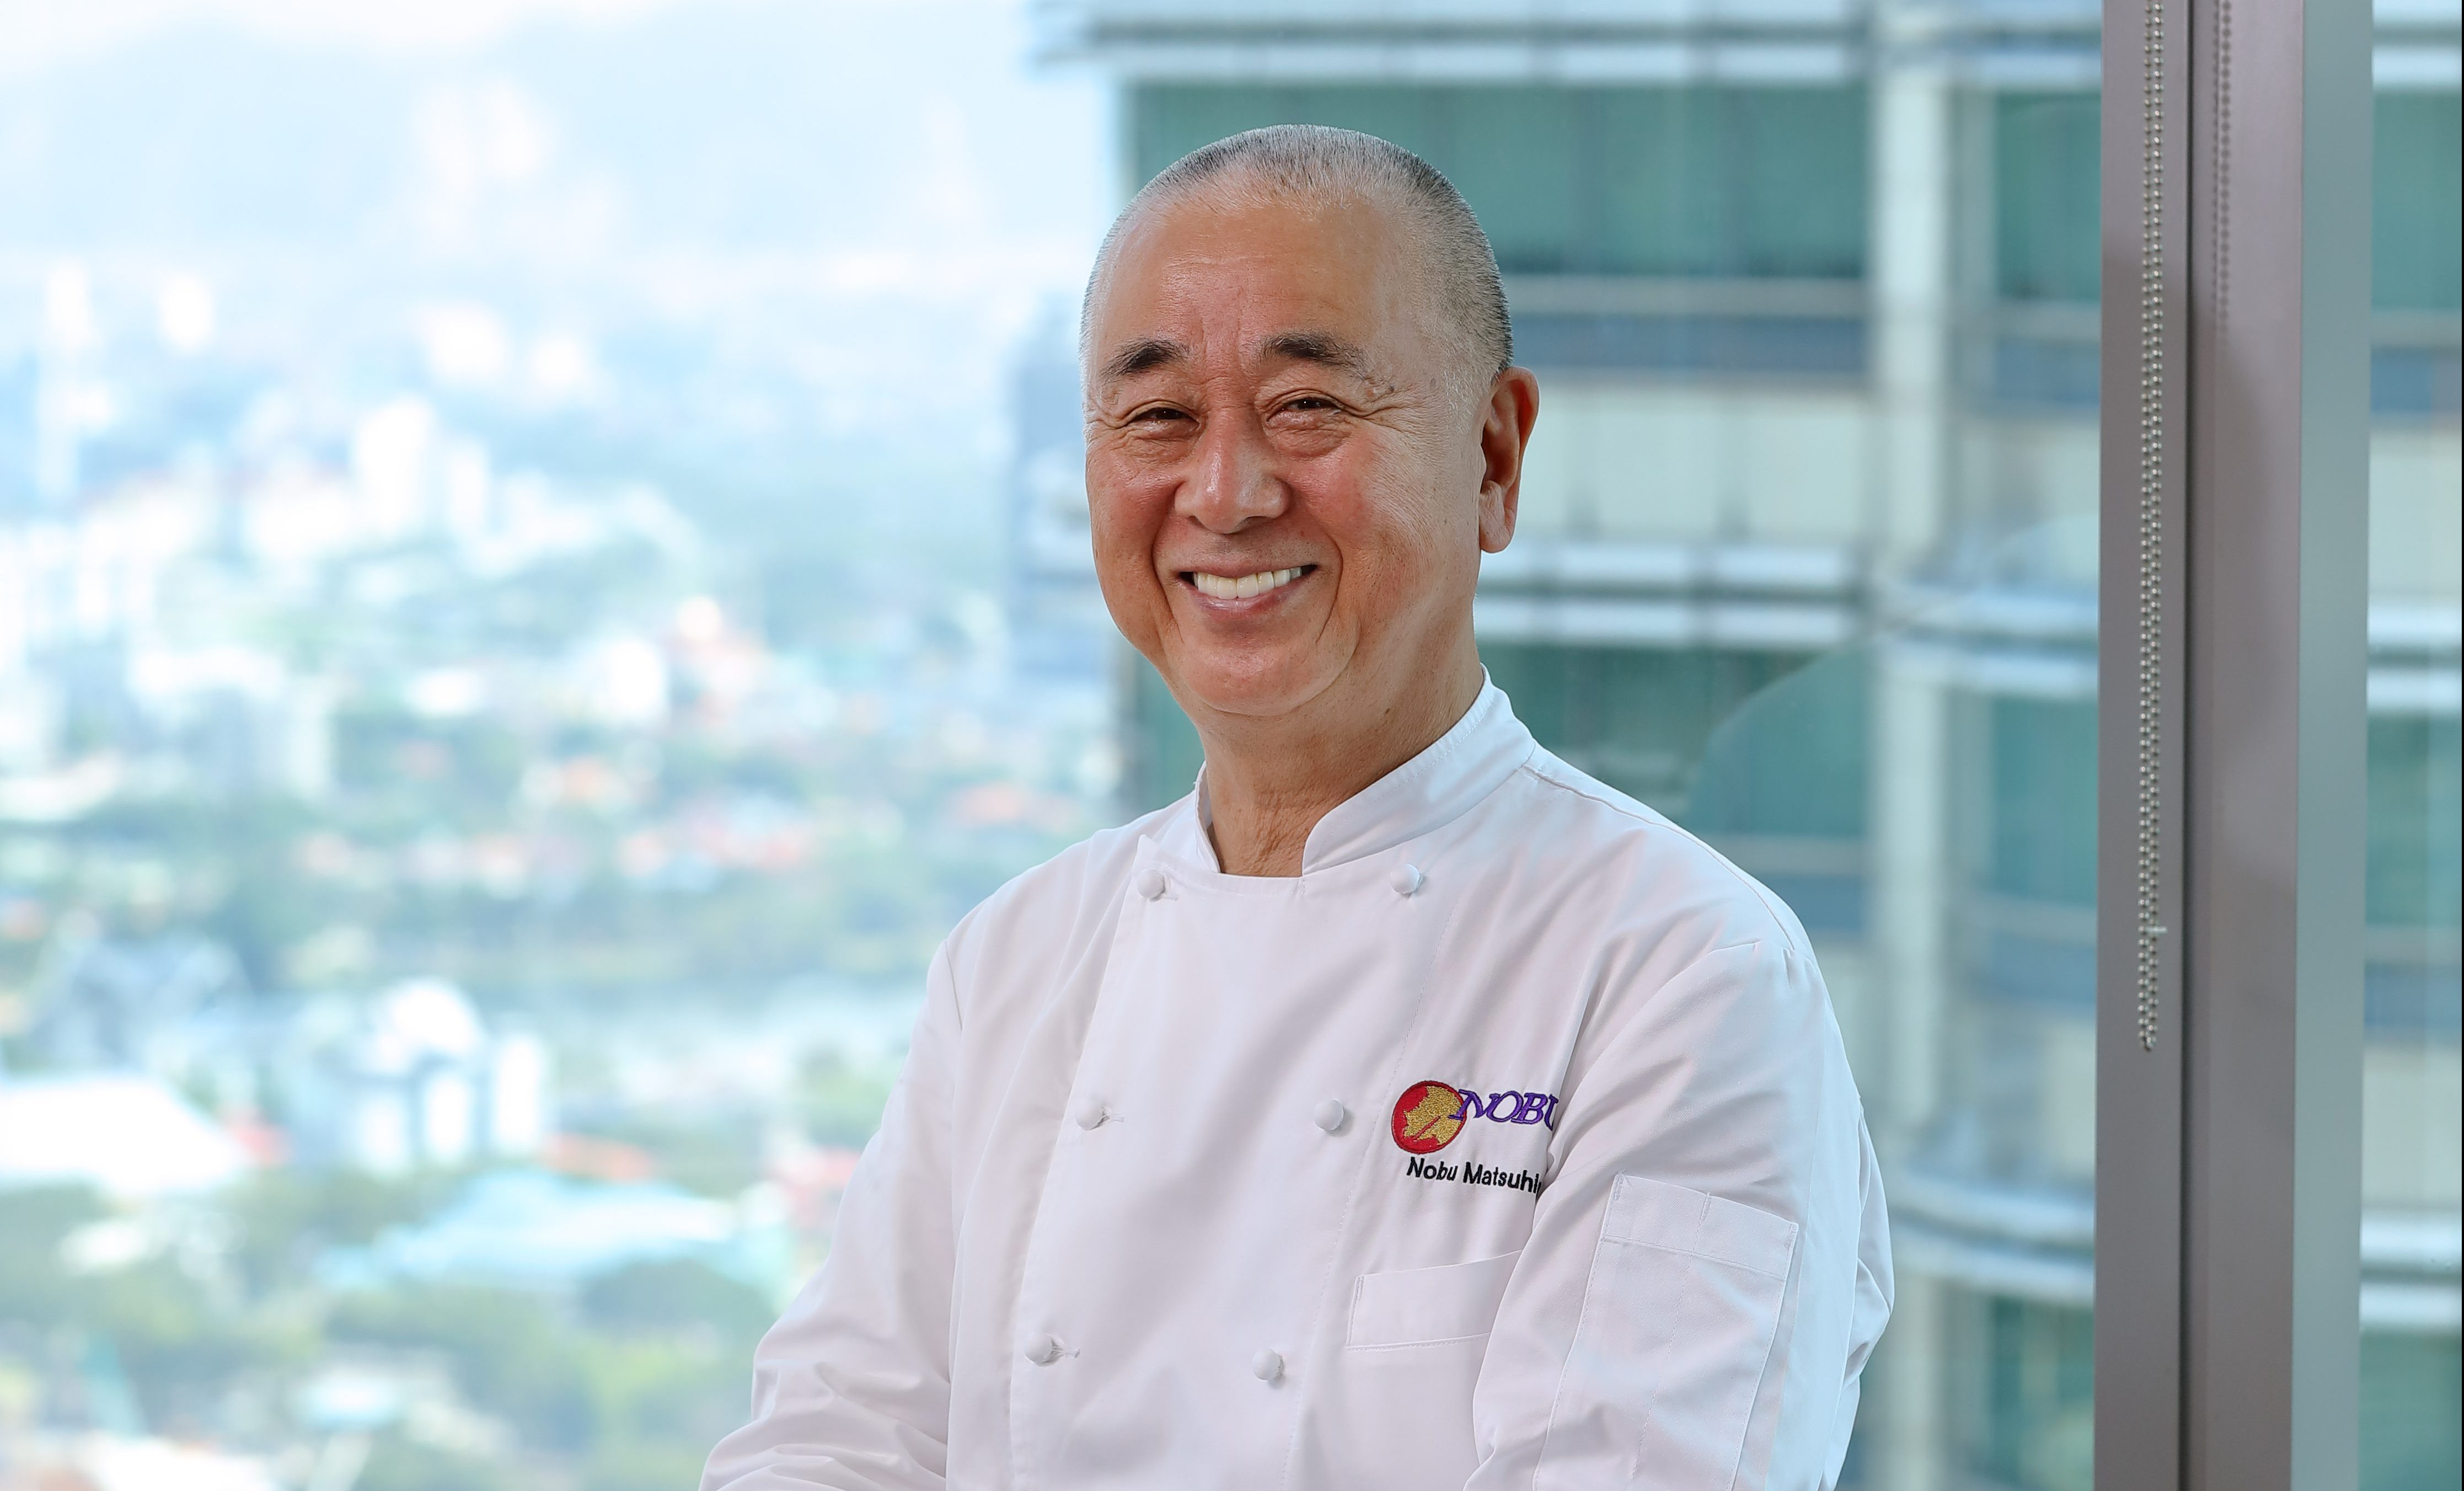 Nobu Matsuhisa shares 4 key tips to run a successful business empire